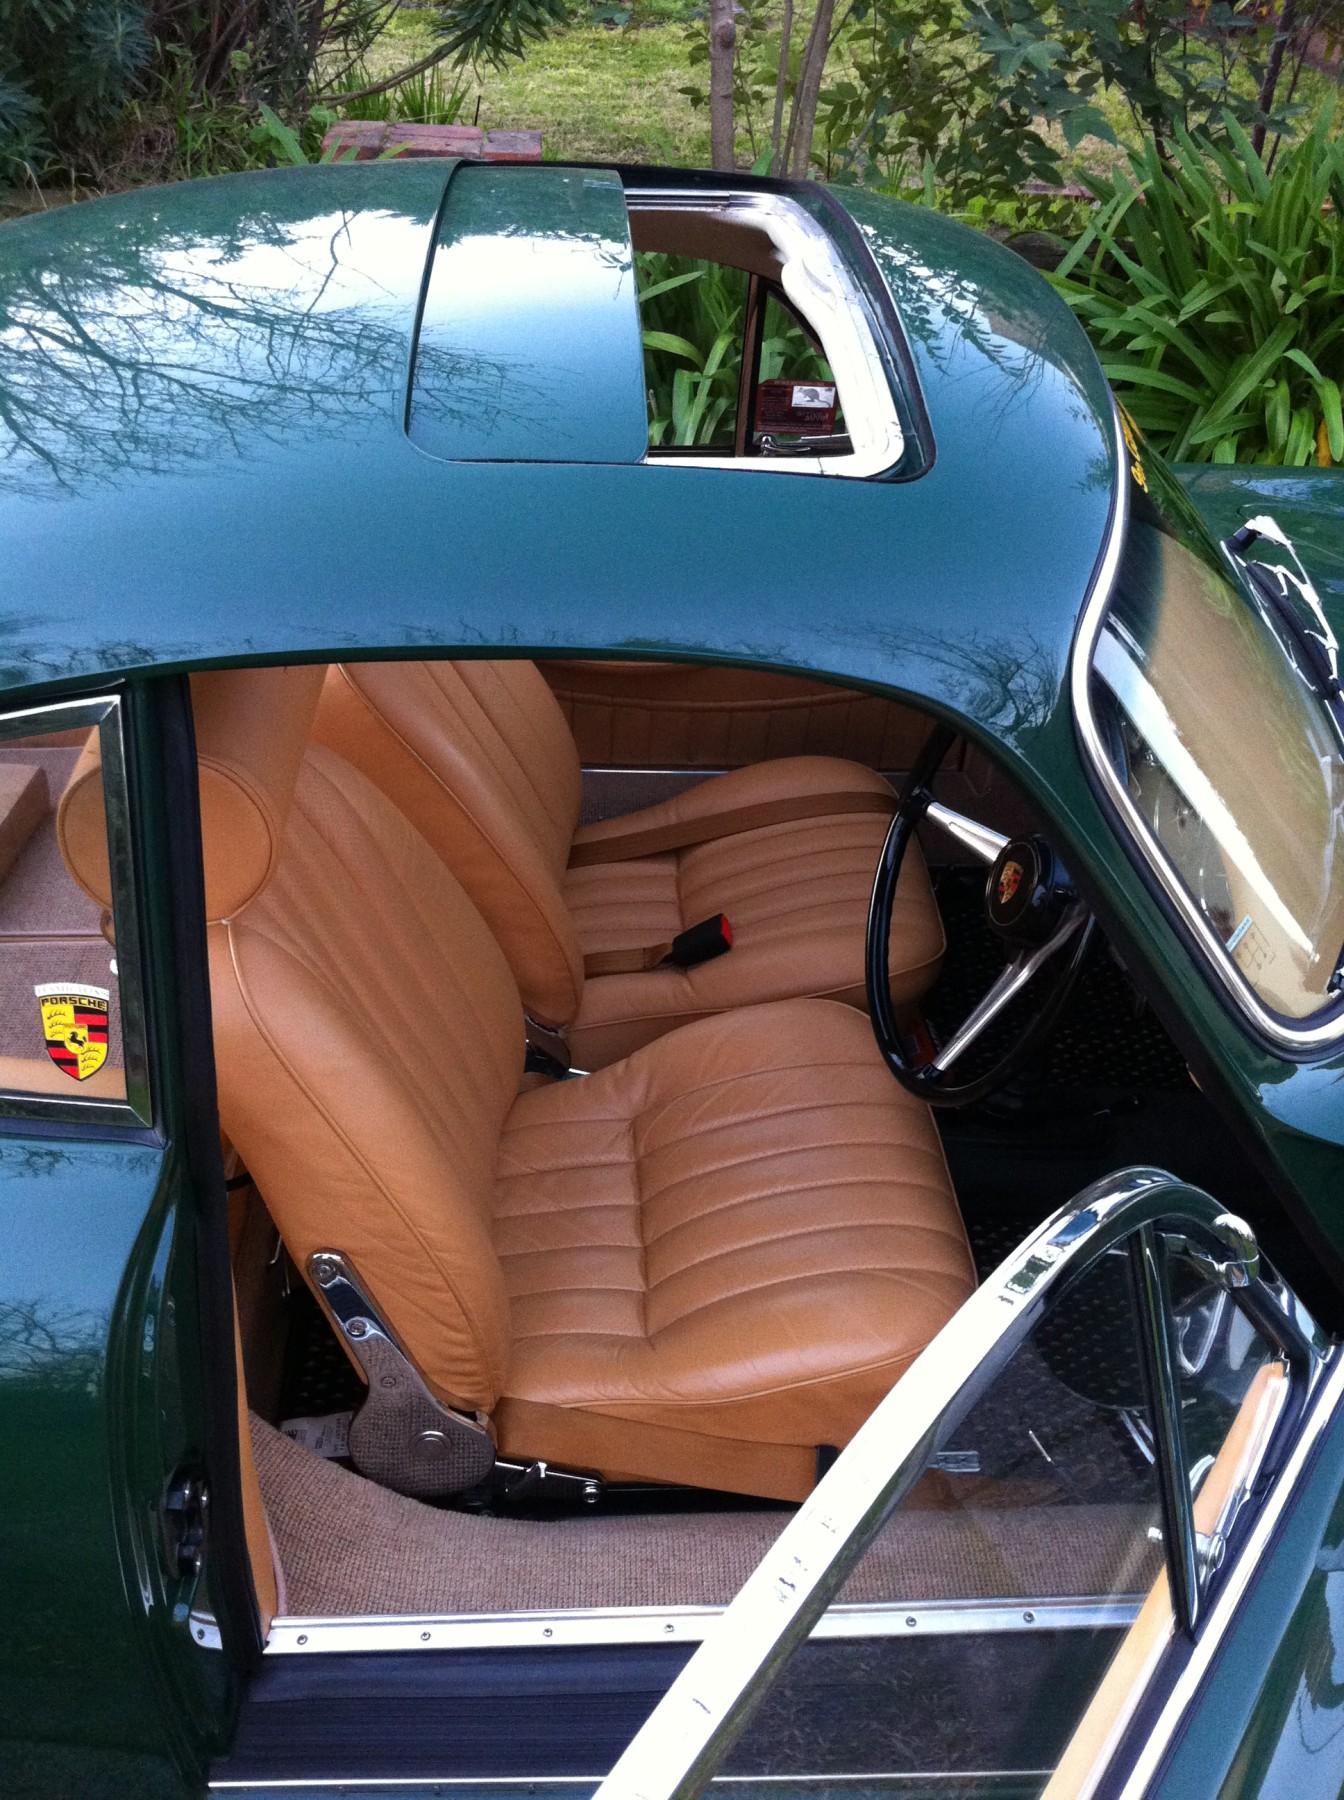 1965 Porsche 356 C - Sunroof